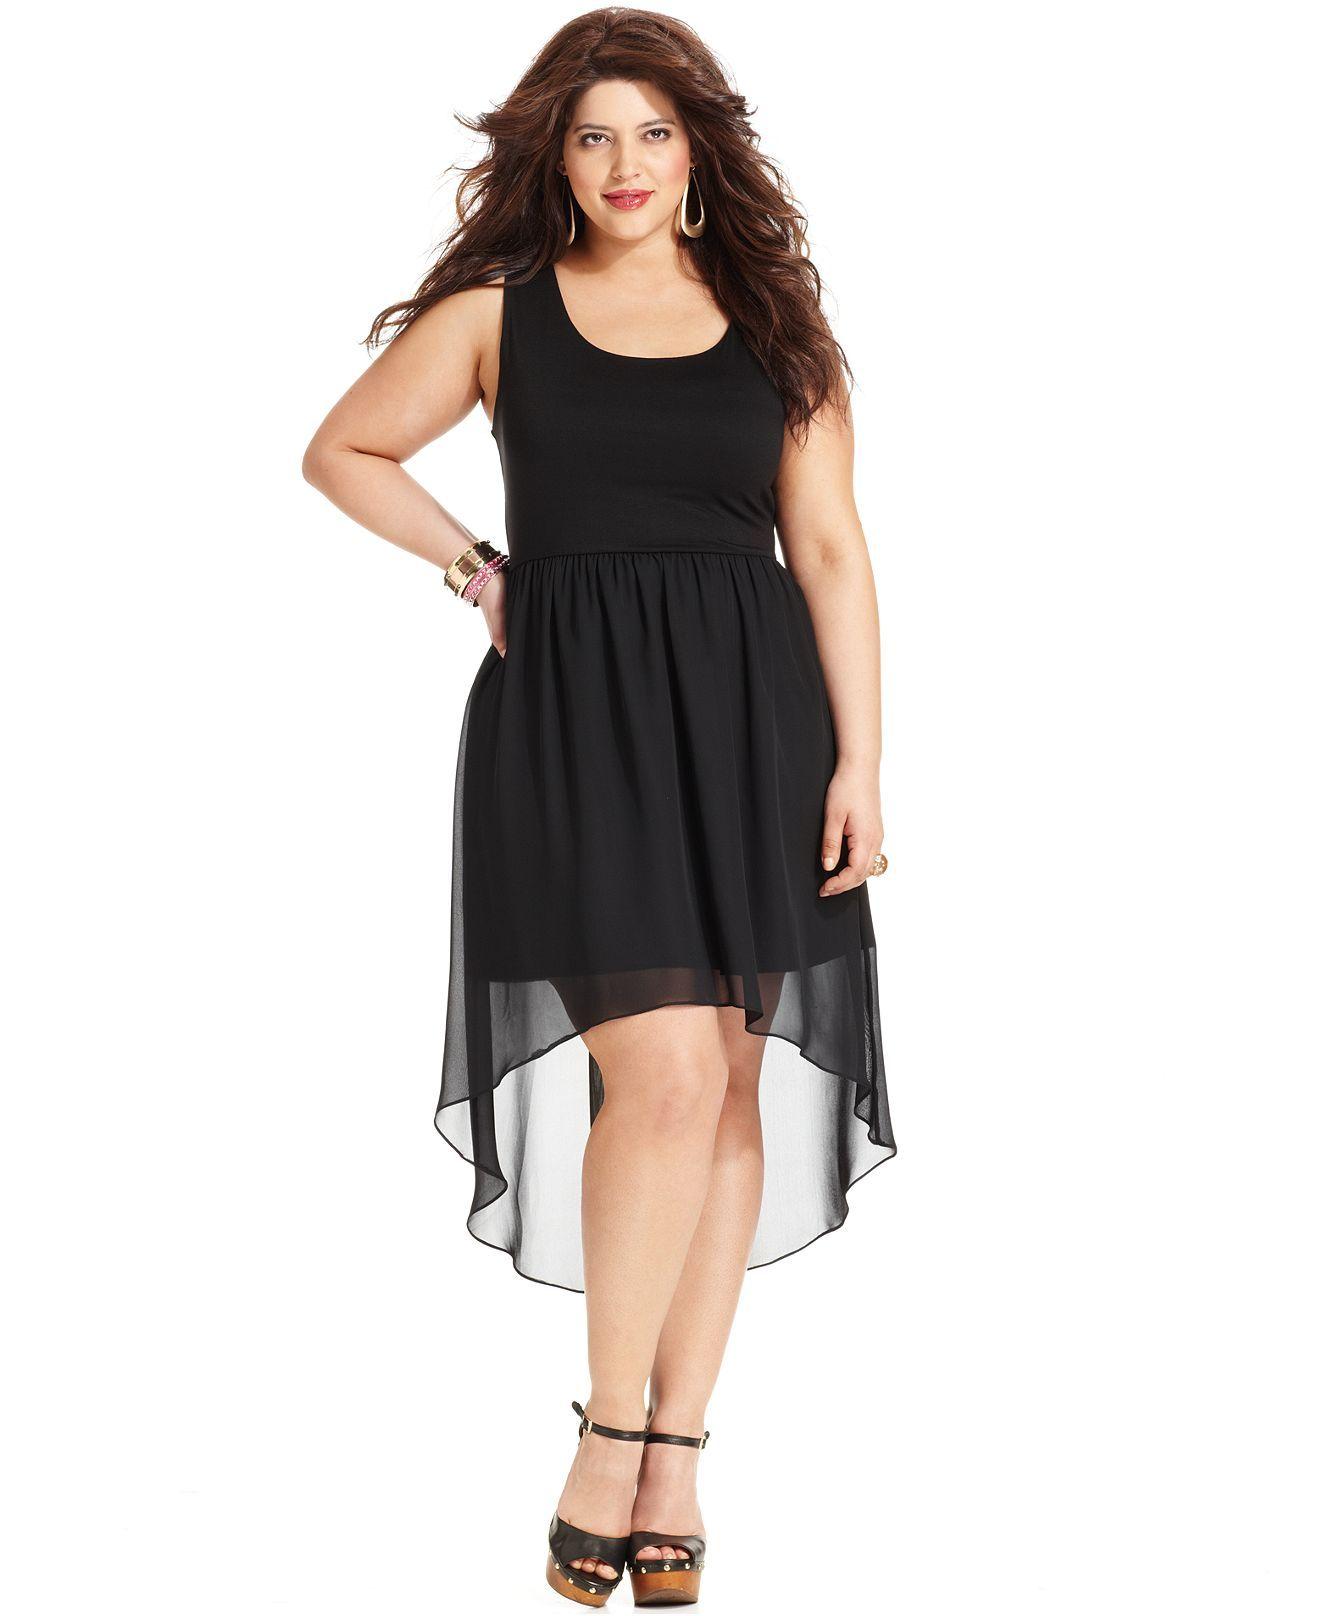 6d68c96f125 Soprano Plus Size Dress